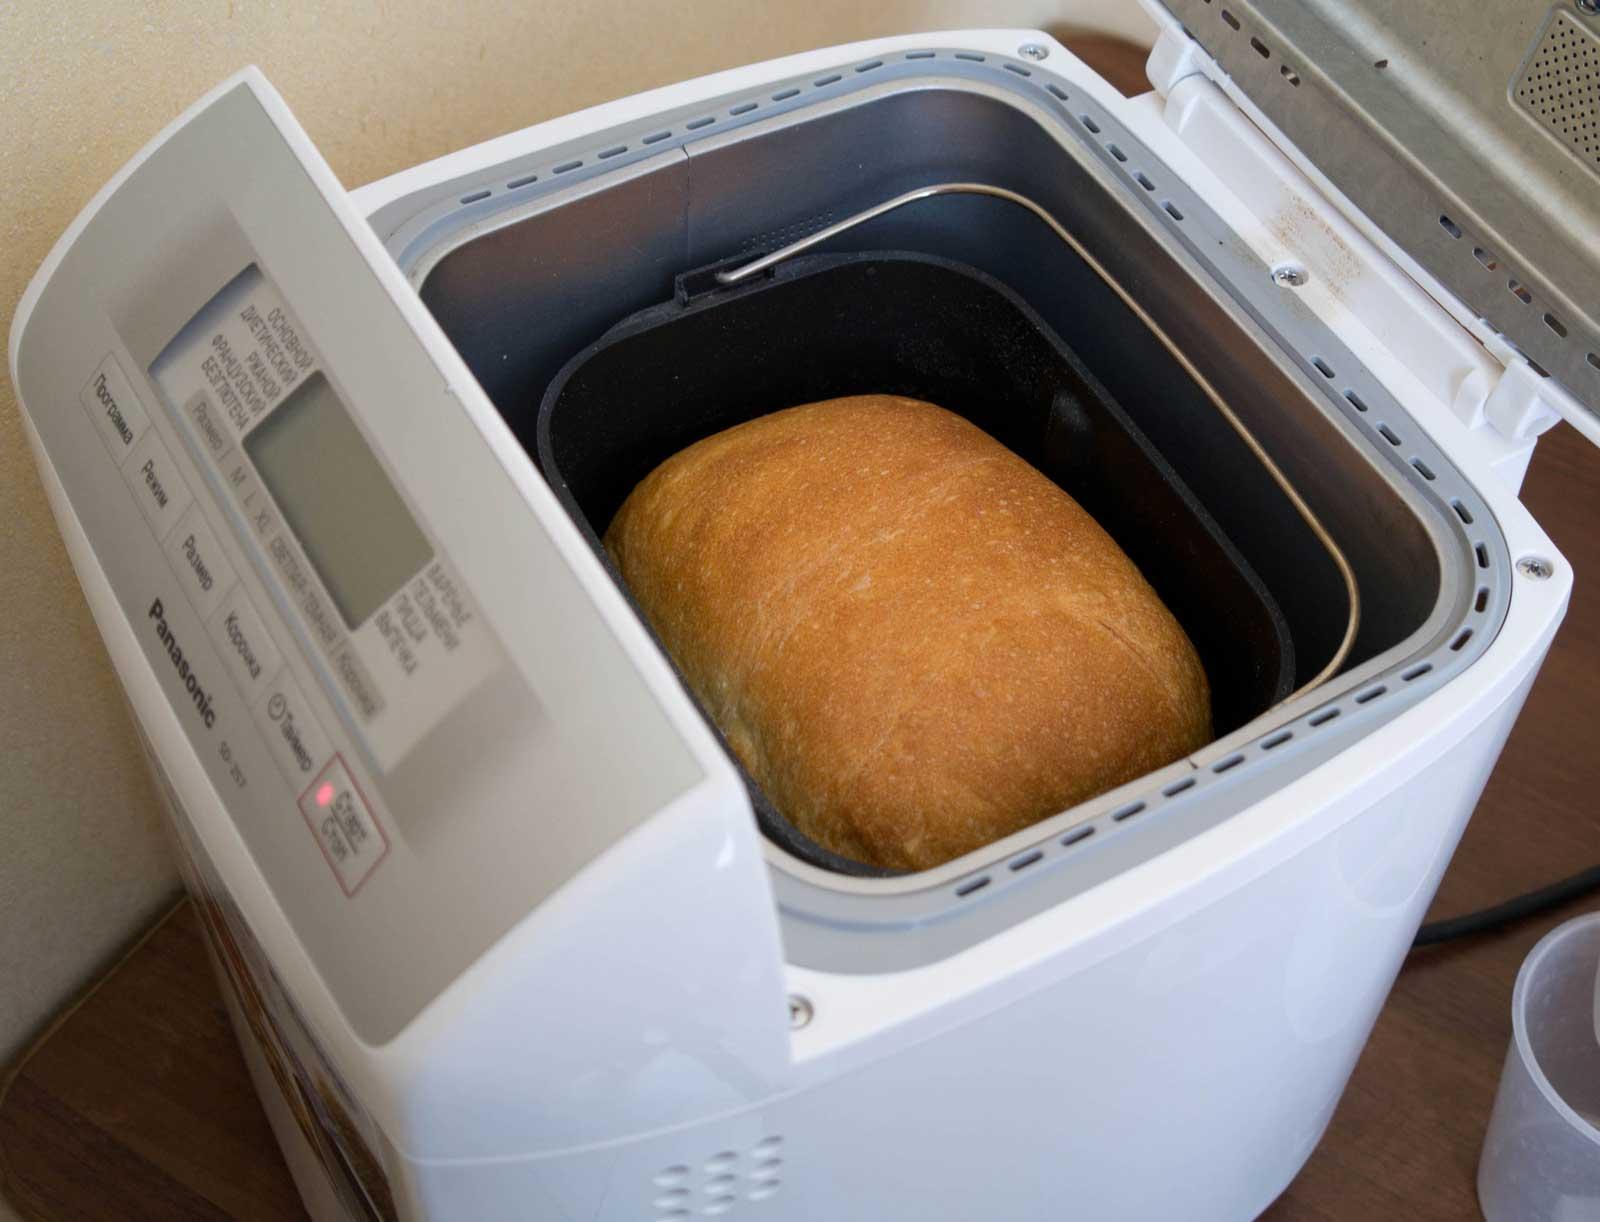 Хлебопечка panasonic sd-zb 2502 bts «лучшая хлебопечка, обзор.